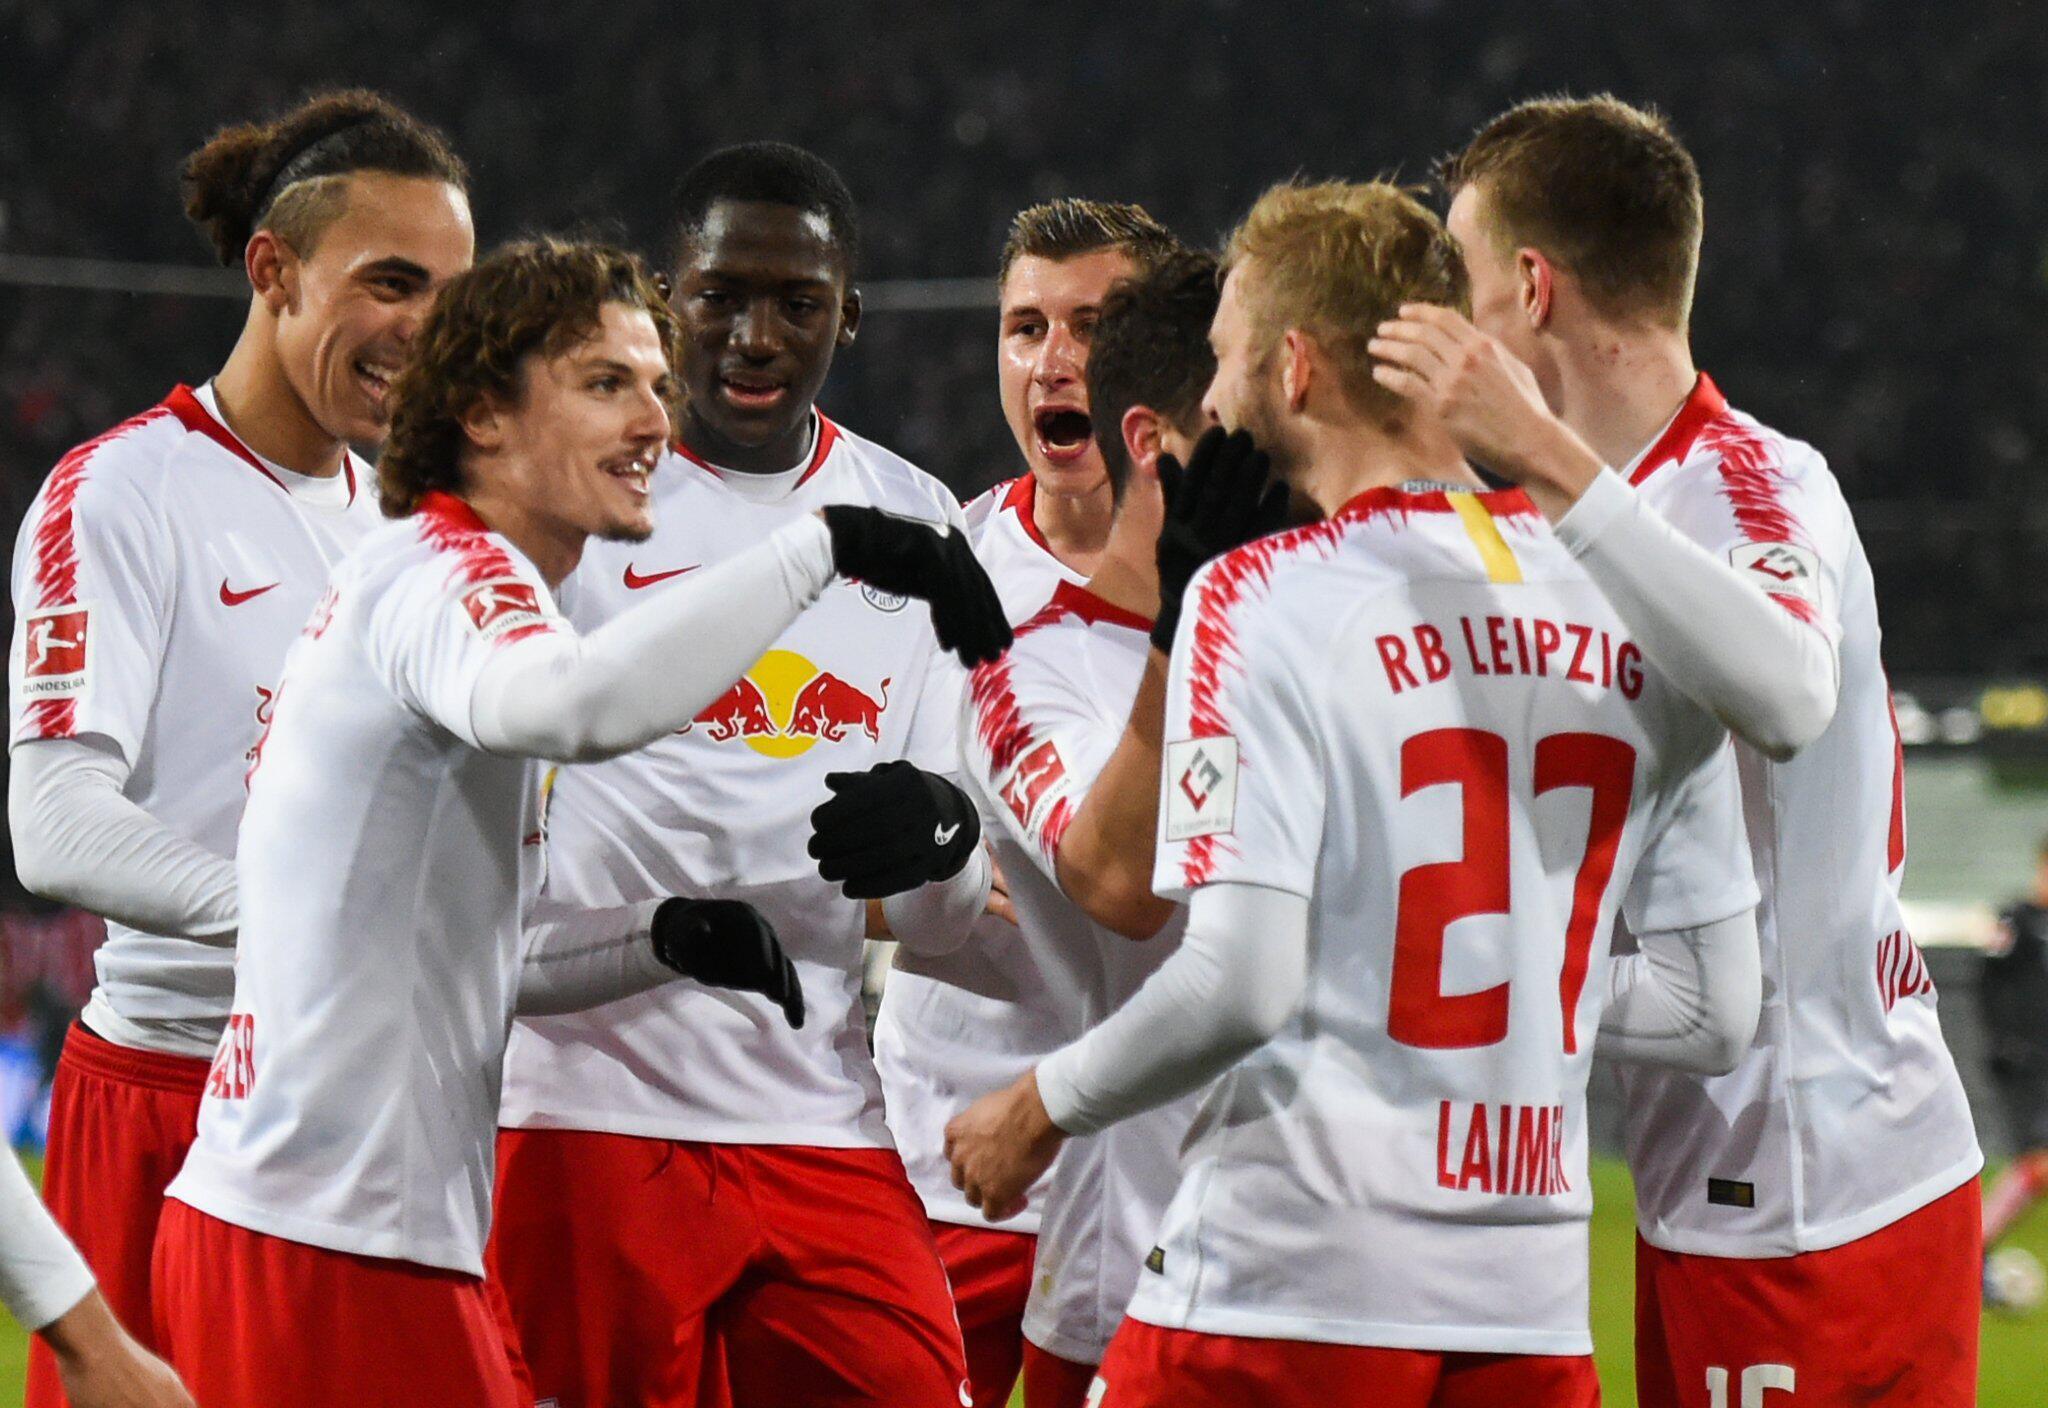 Bild zu Fortuna Düsseldorf - RB Leipzig